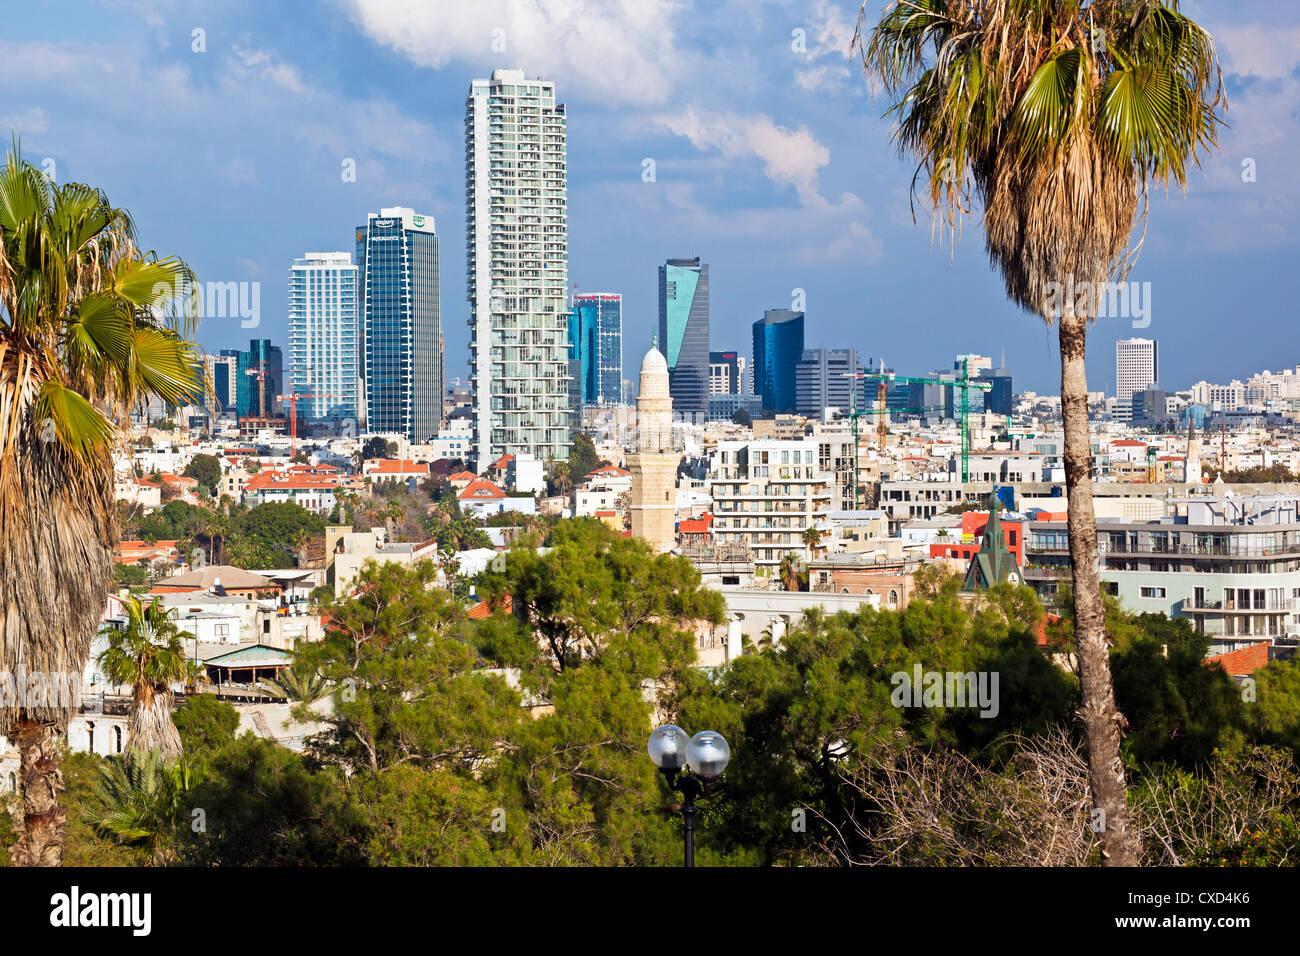 Downtown buildings viewed from HaPisgah Gardens (The Summit Garden), Jaffa, Tel Aviv, Israel, Middle East - Stock Image